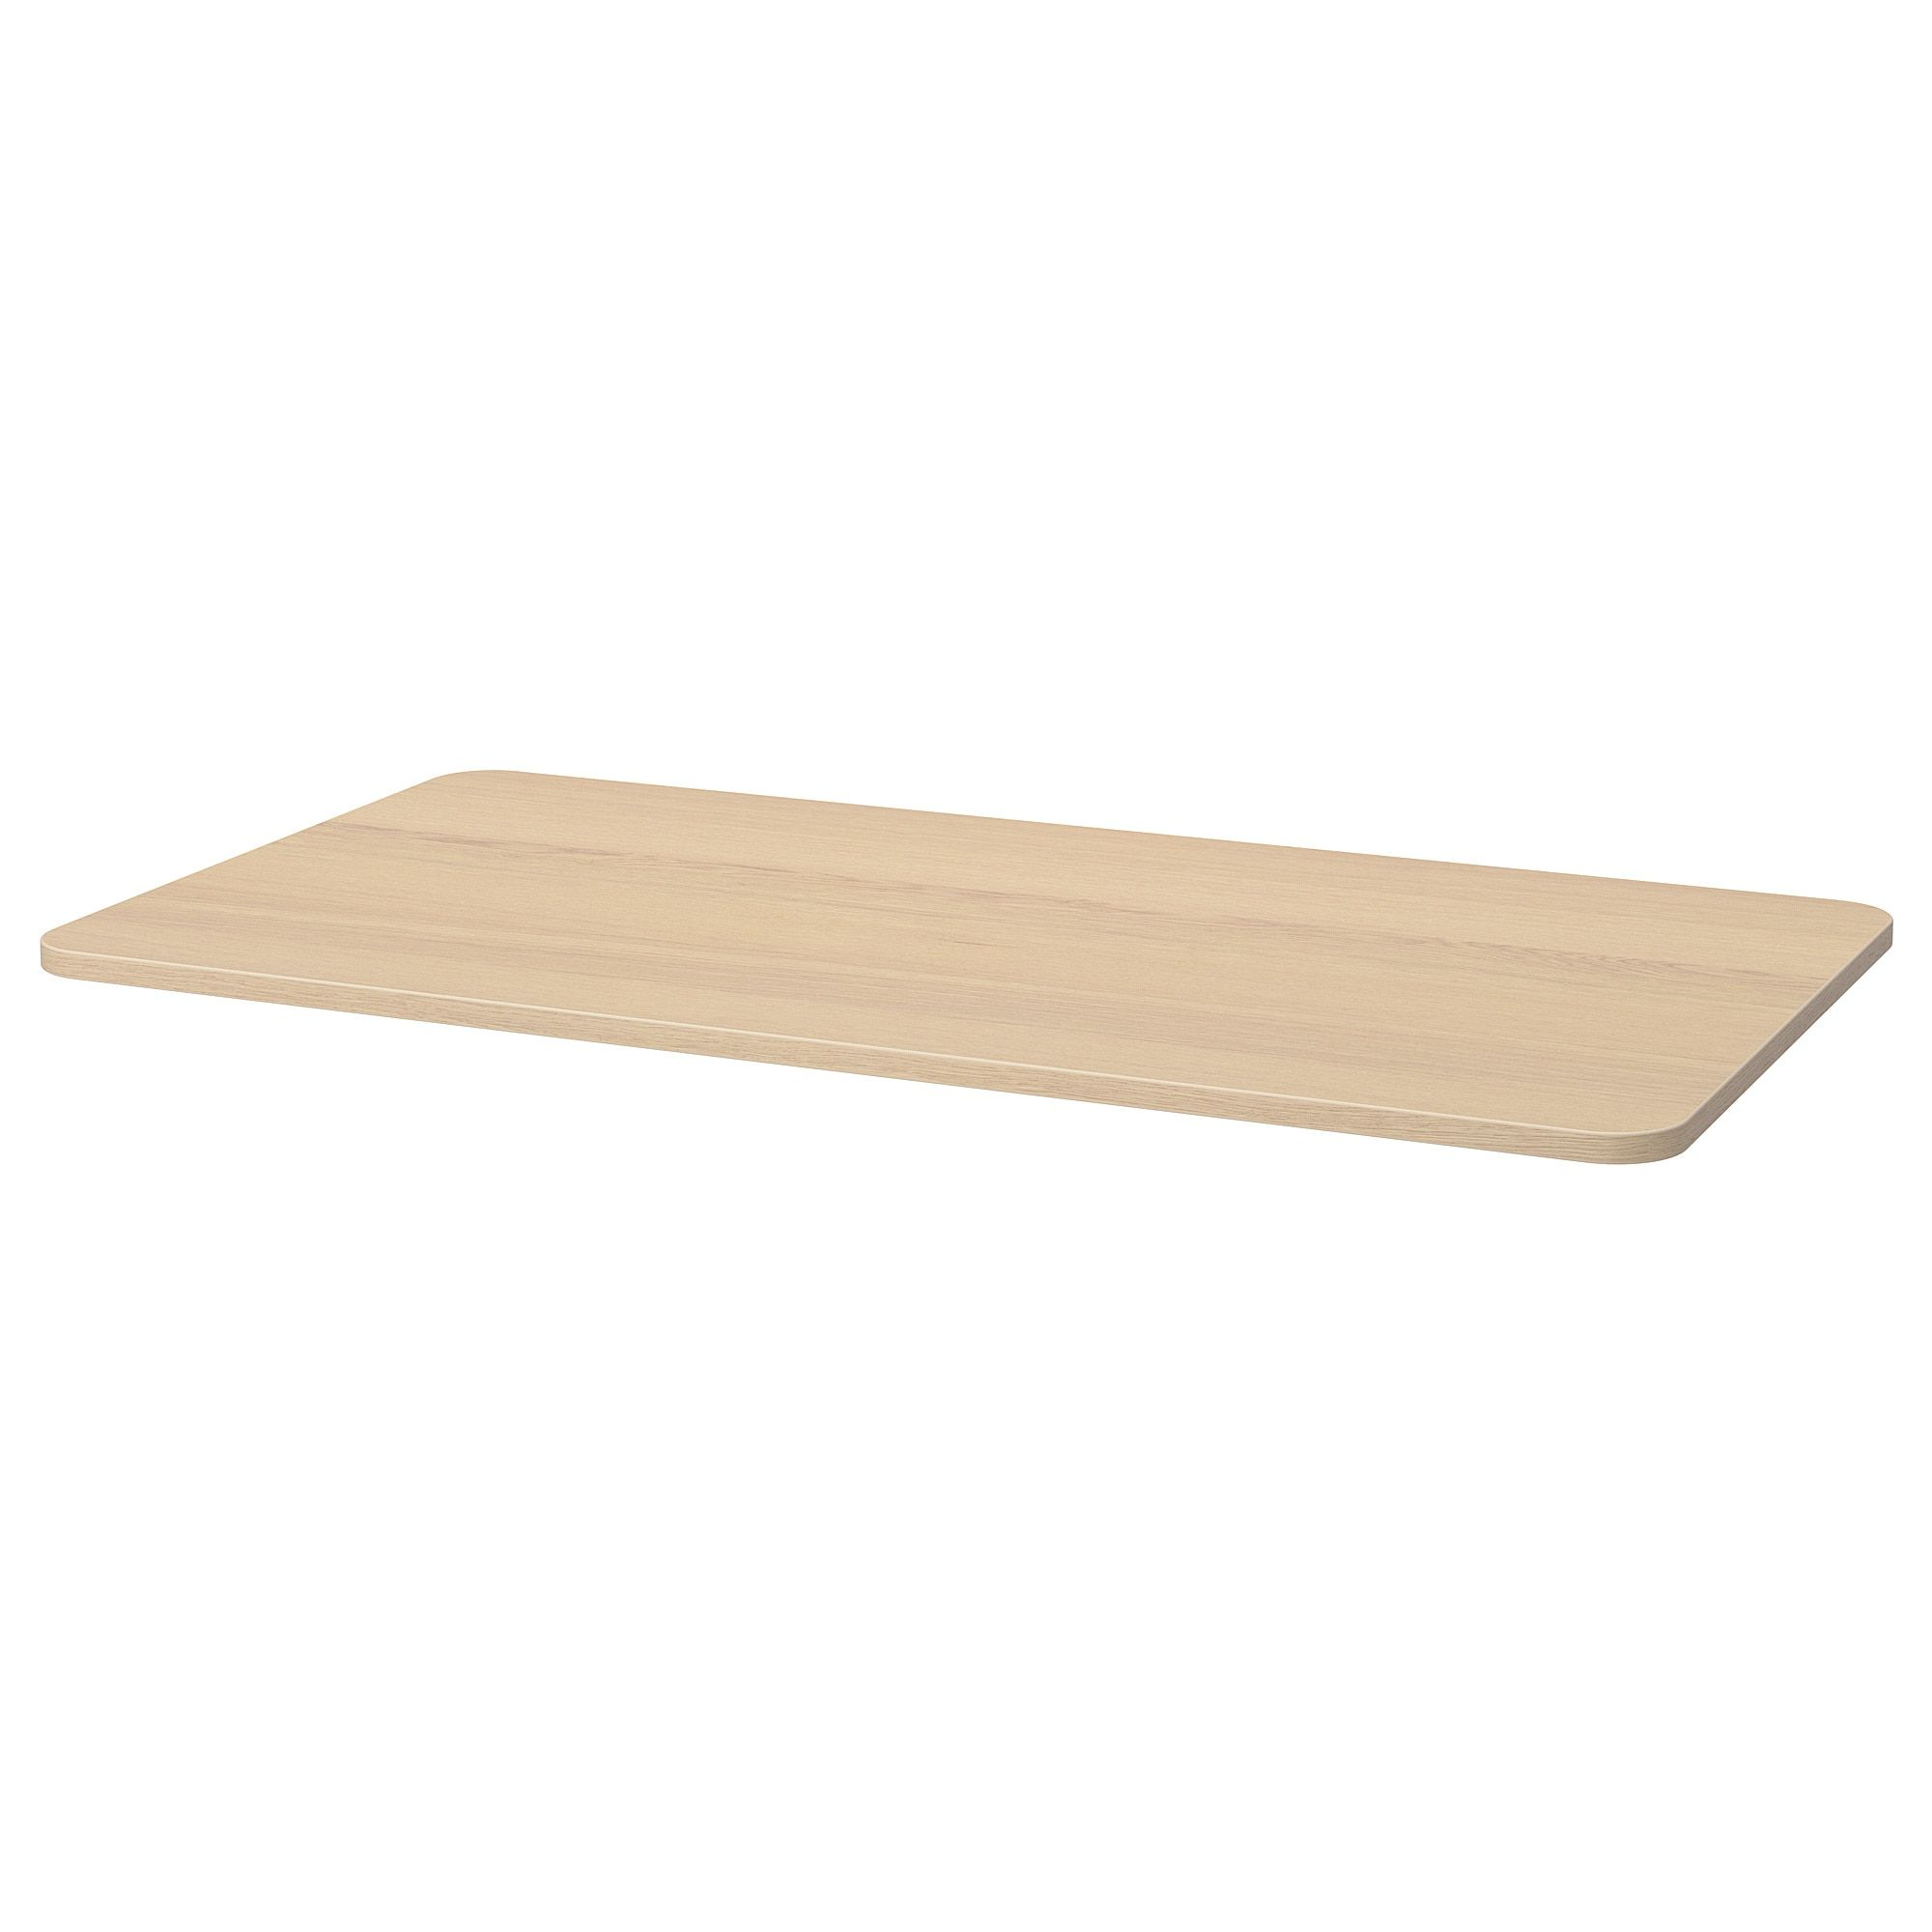 Tommaryd IKEA Modular Dining Tables,   KF   Ikea tischplatten ...